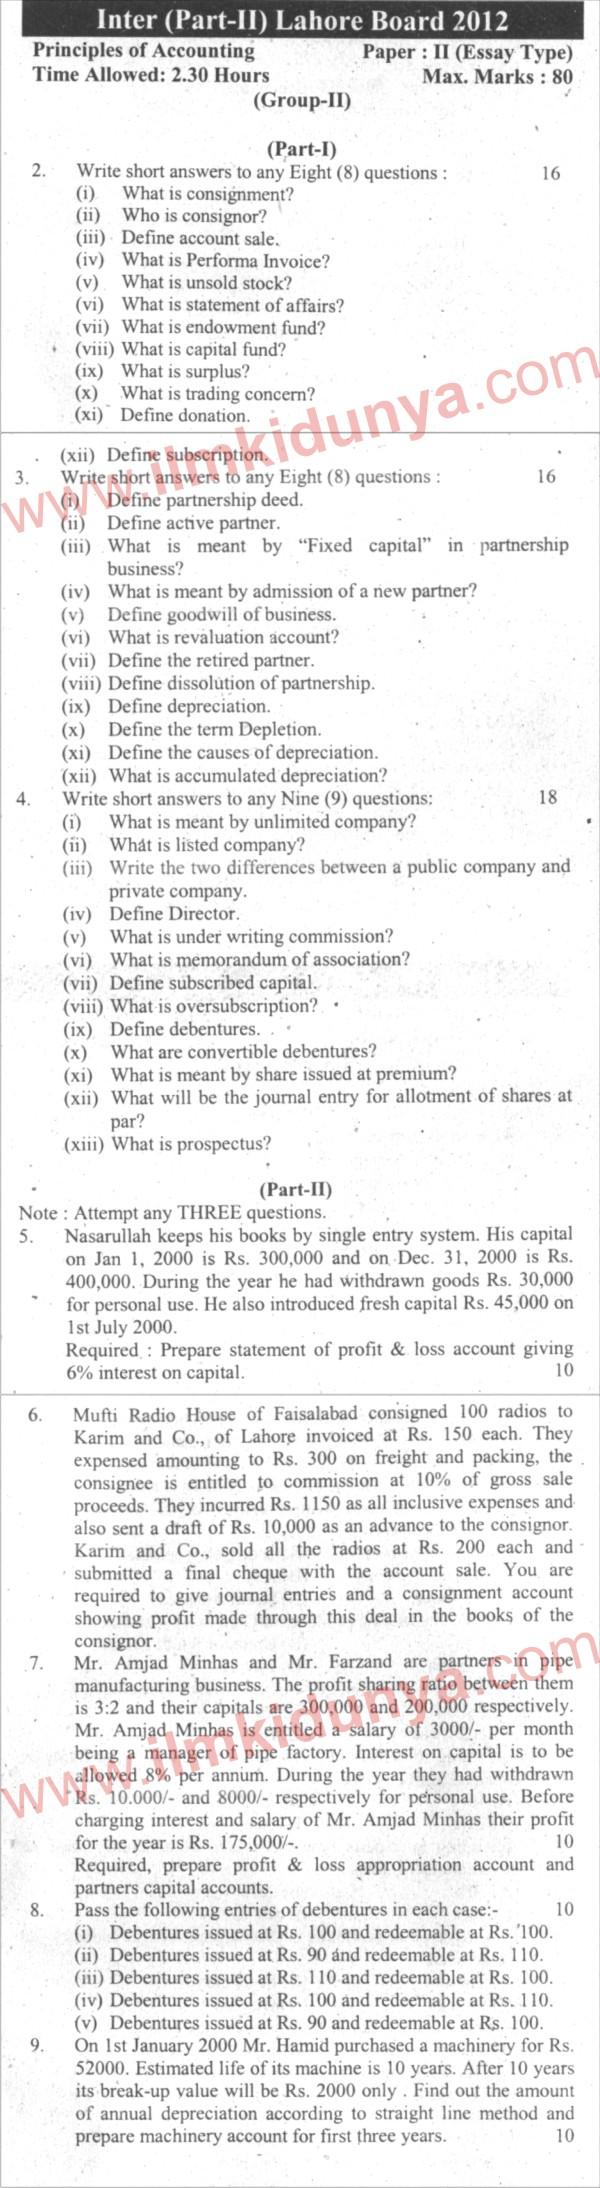 Accounting theory essay